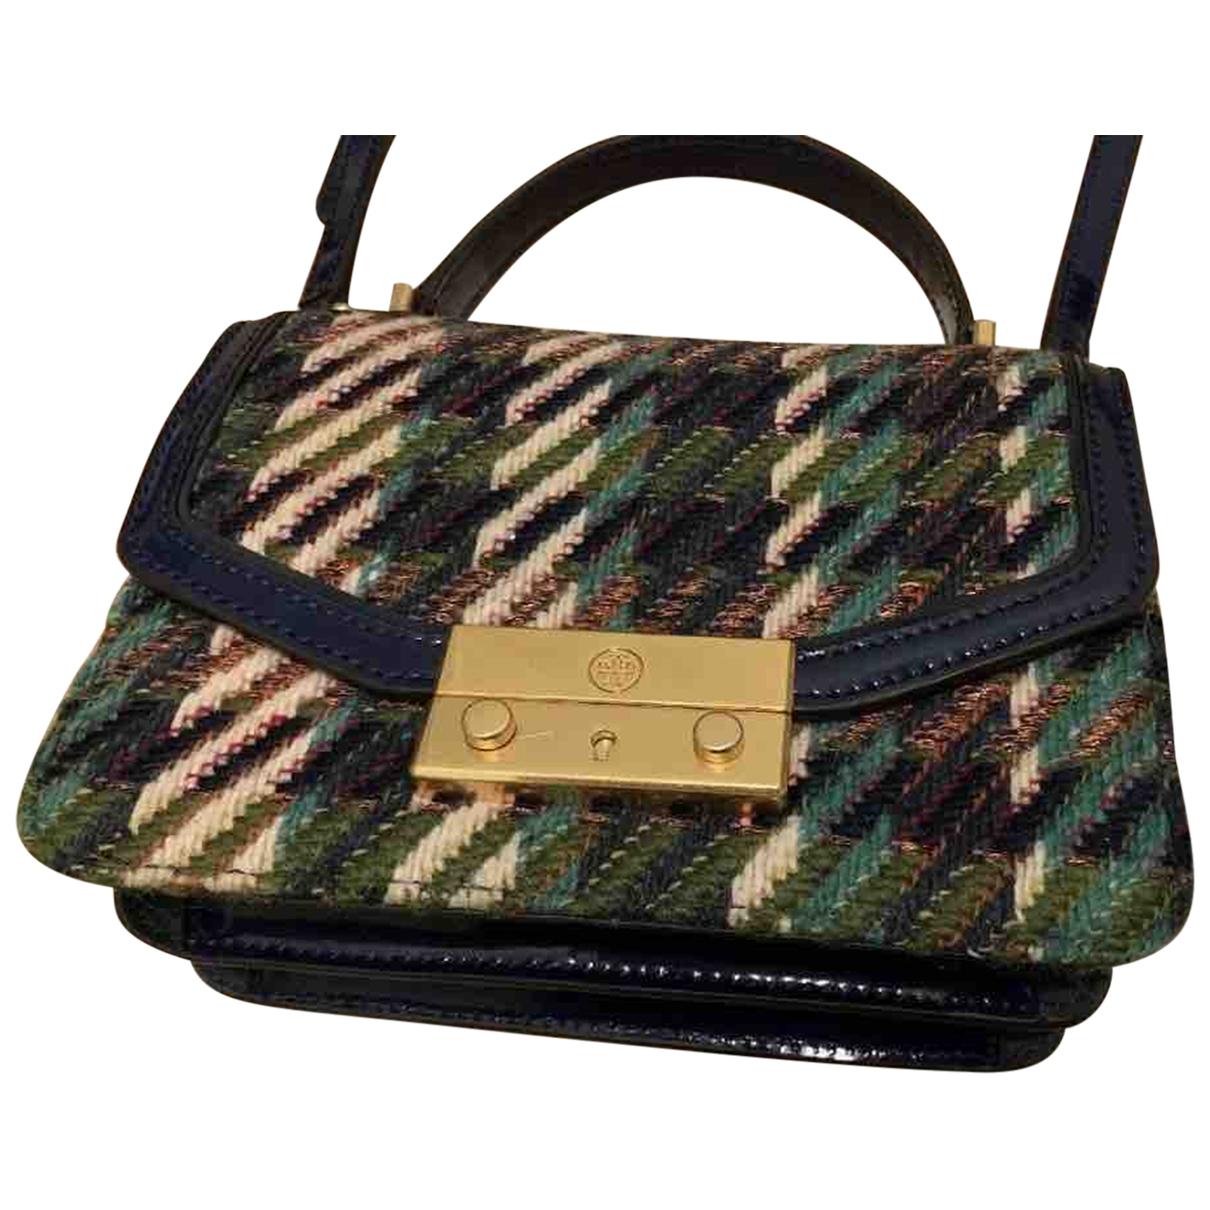 Tory Burch \N Multicolour Tweed handbag for Women \N